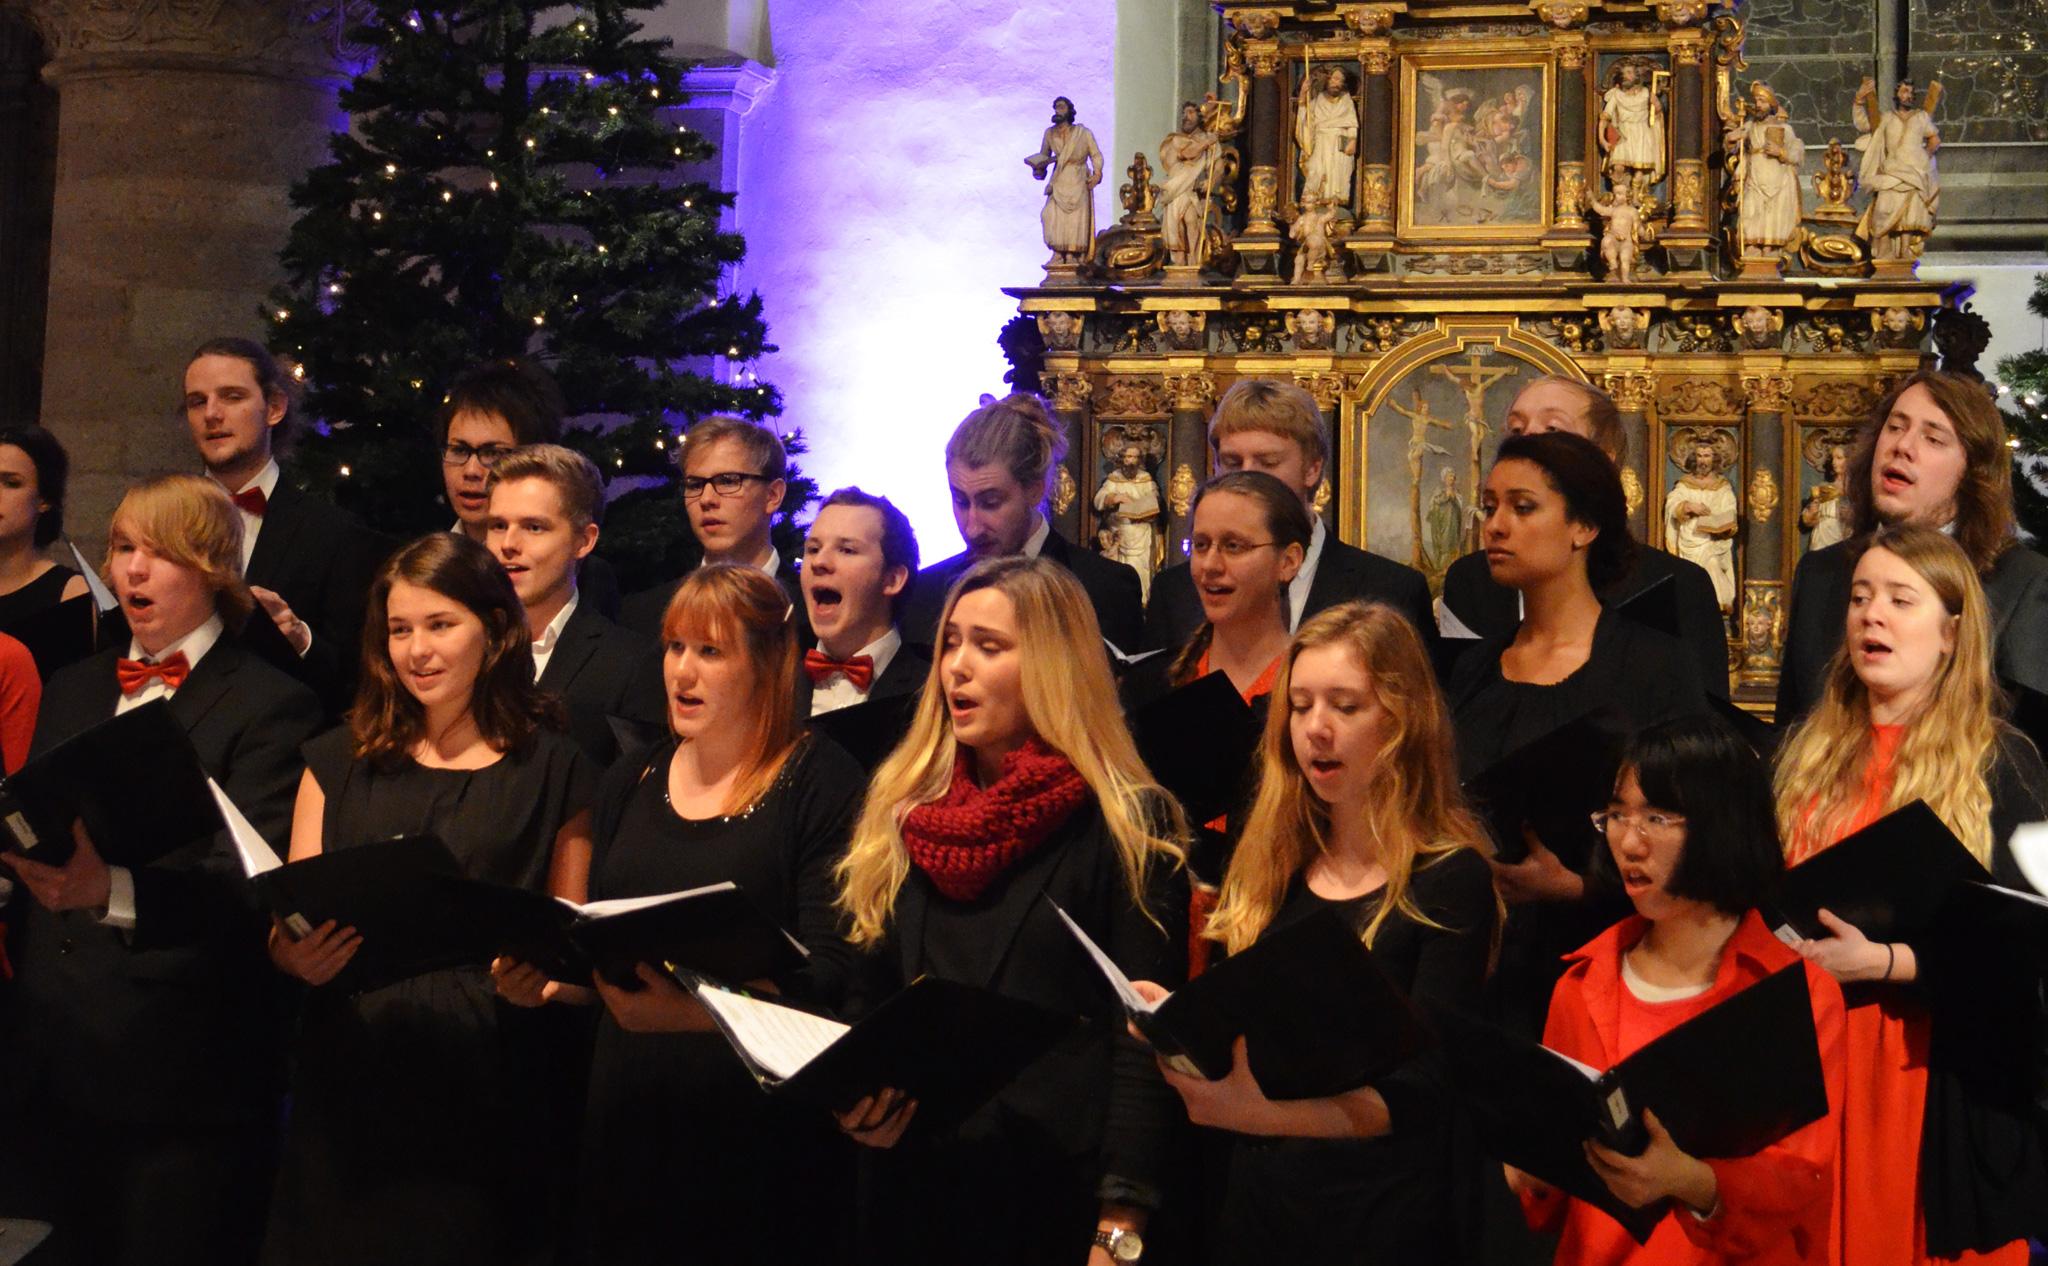 Julkonsert Nicolaikyrkan 19/12 2013 - 1